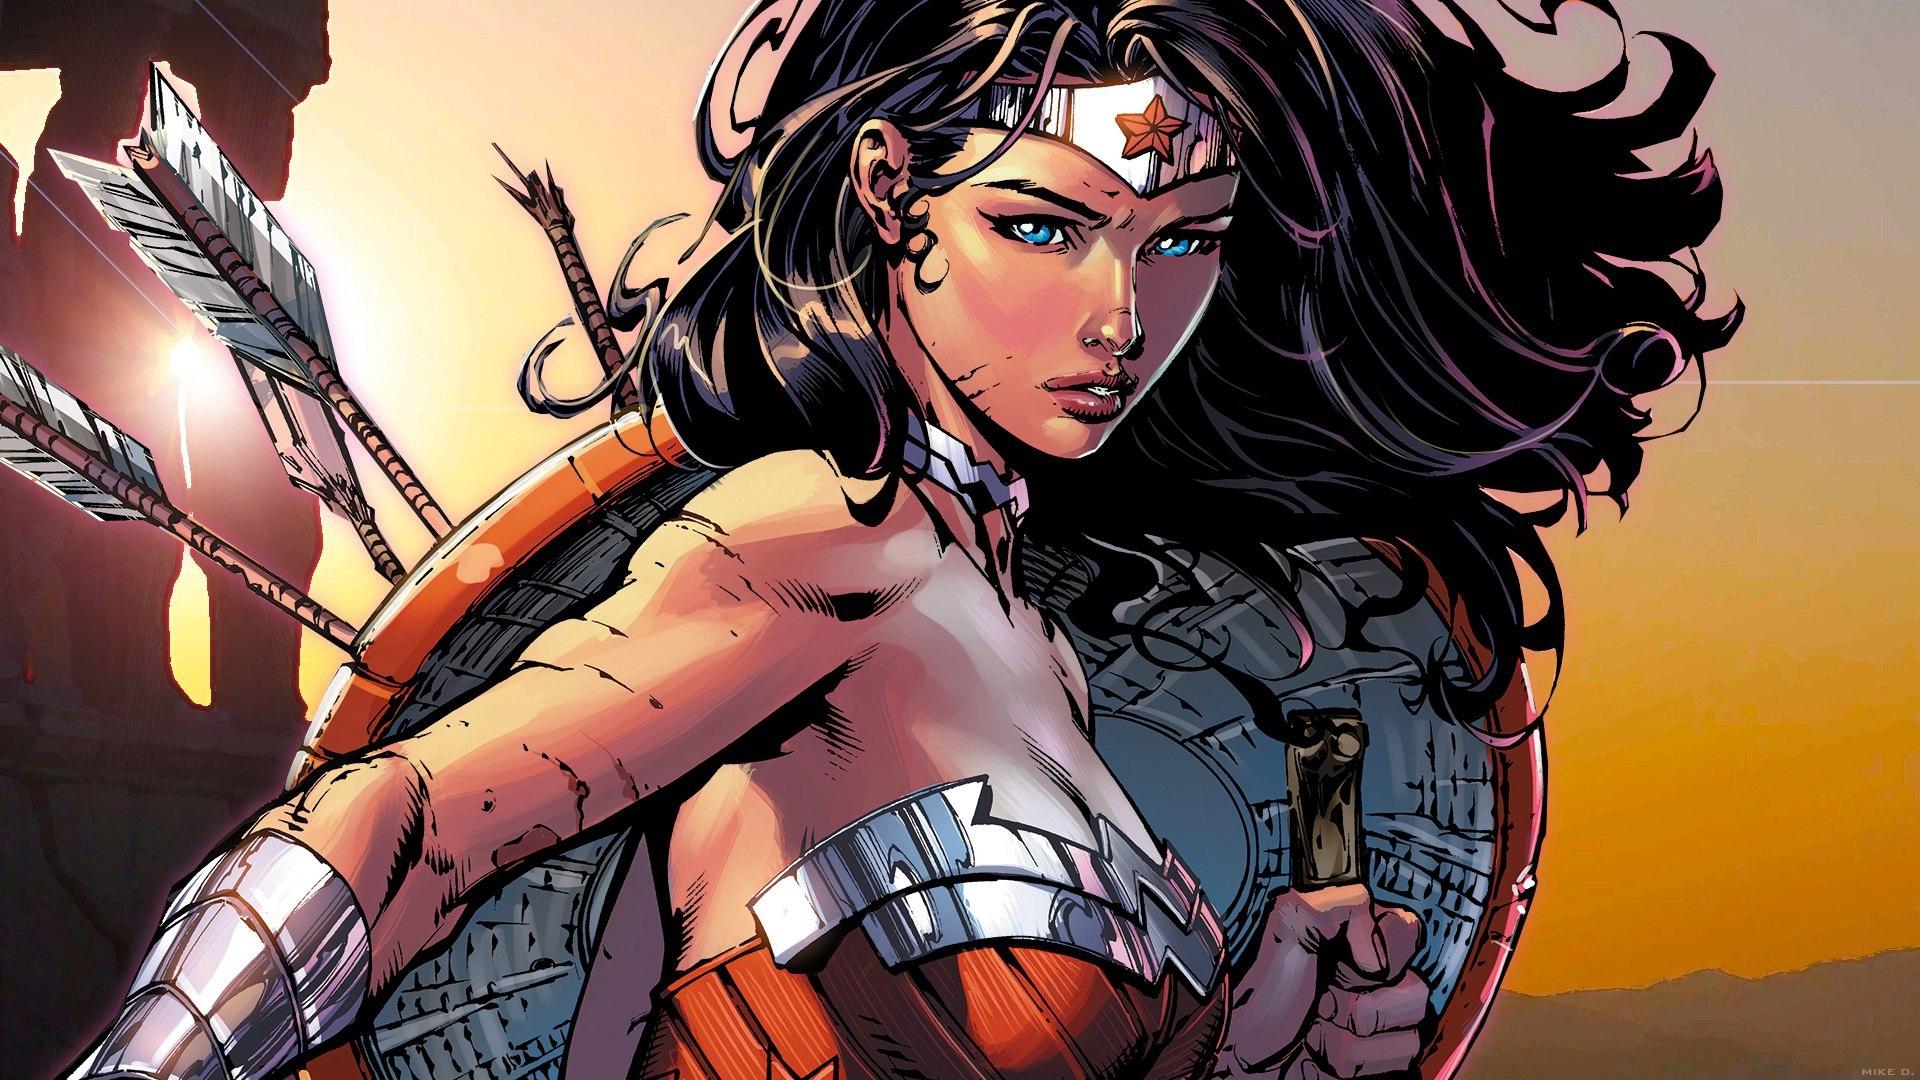 Fondos De Pantalla Wonder Woman Diana Imagen De Arte